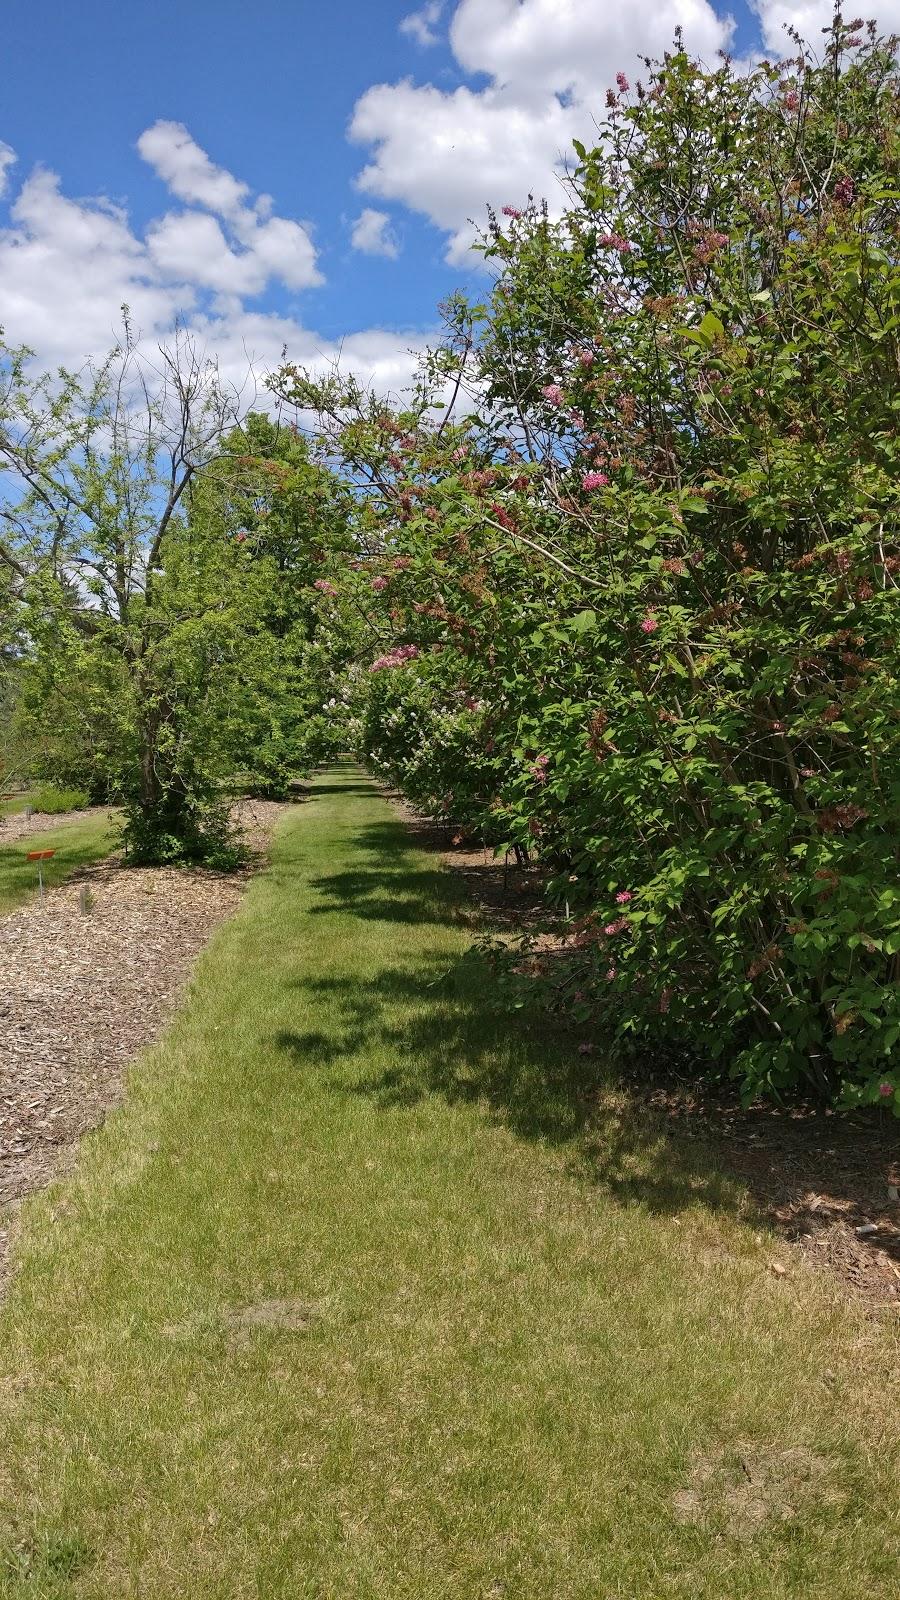 Patterson Garden | park | Preston Ave N, Saskatoon, SK S7N 2W4, Canada